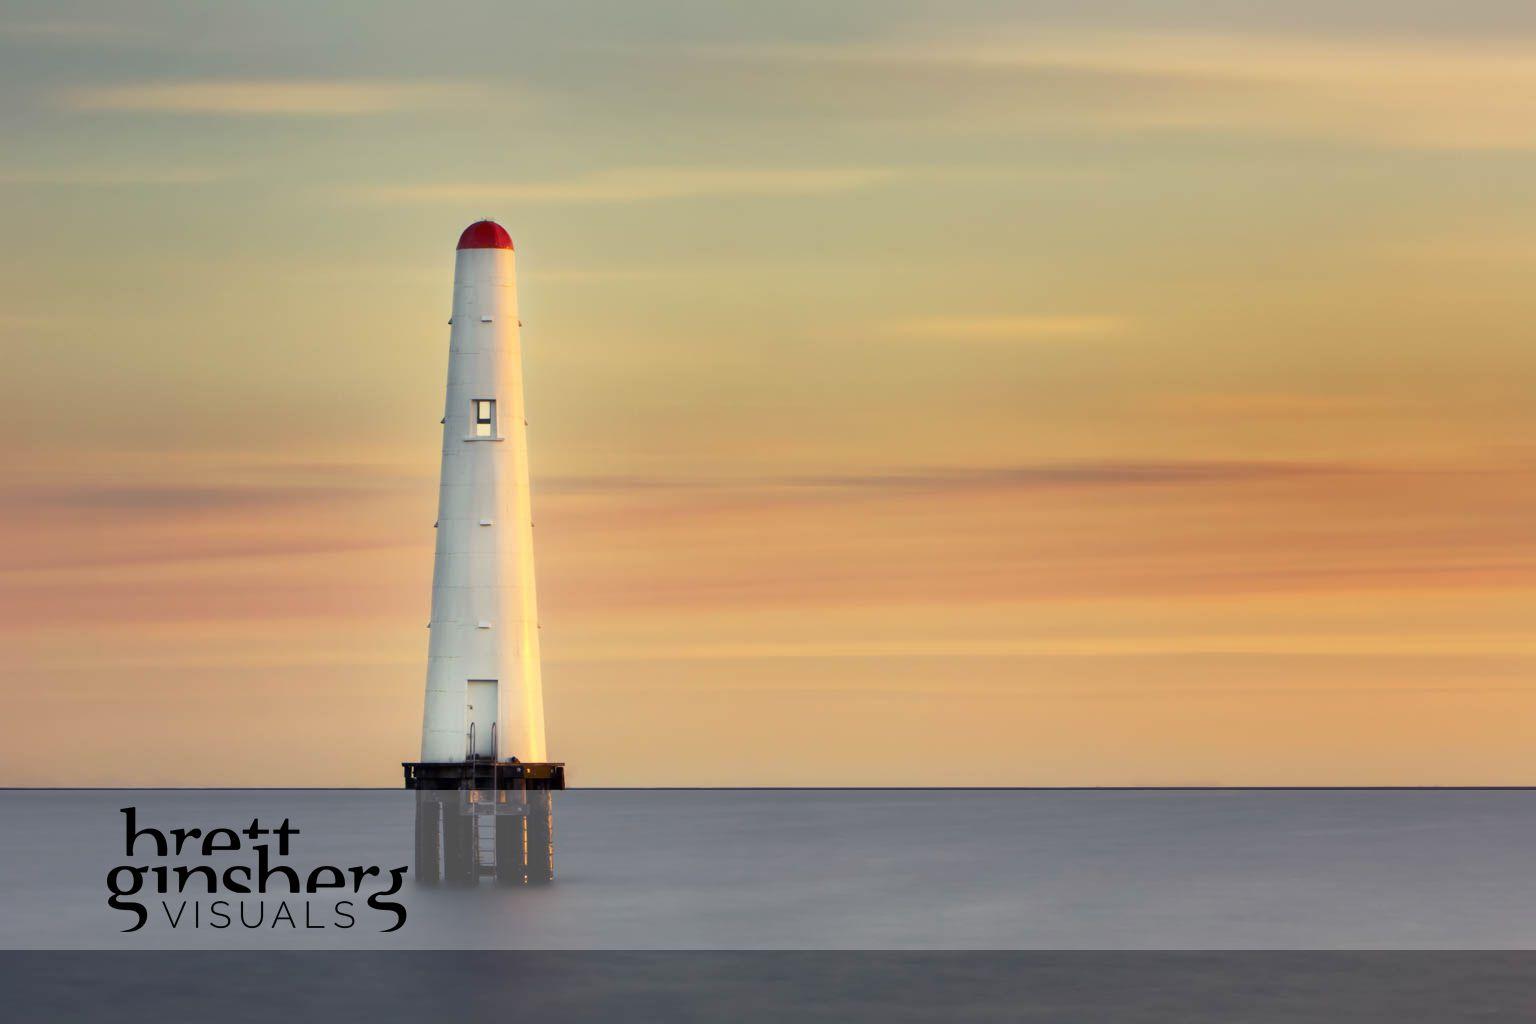 port melbourne beacon at sun set